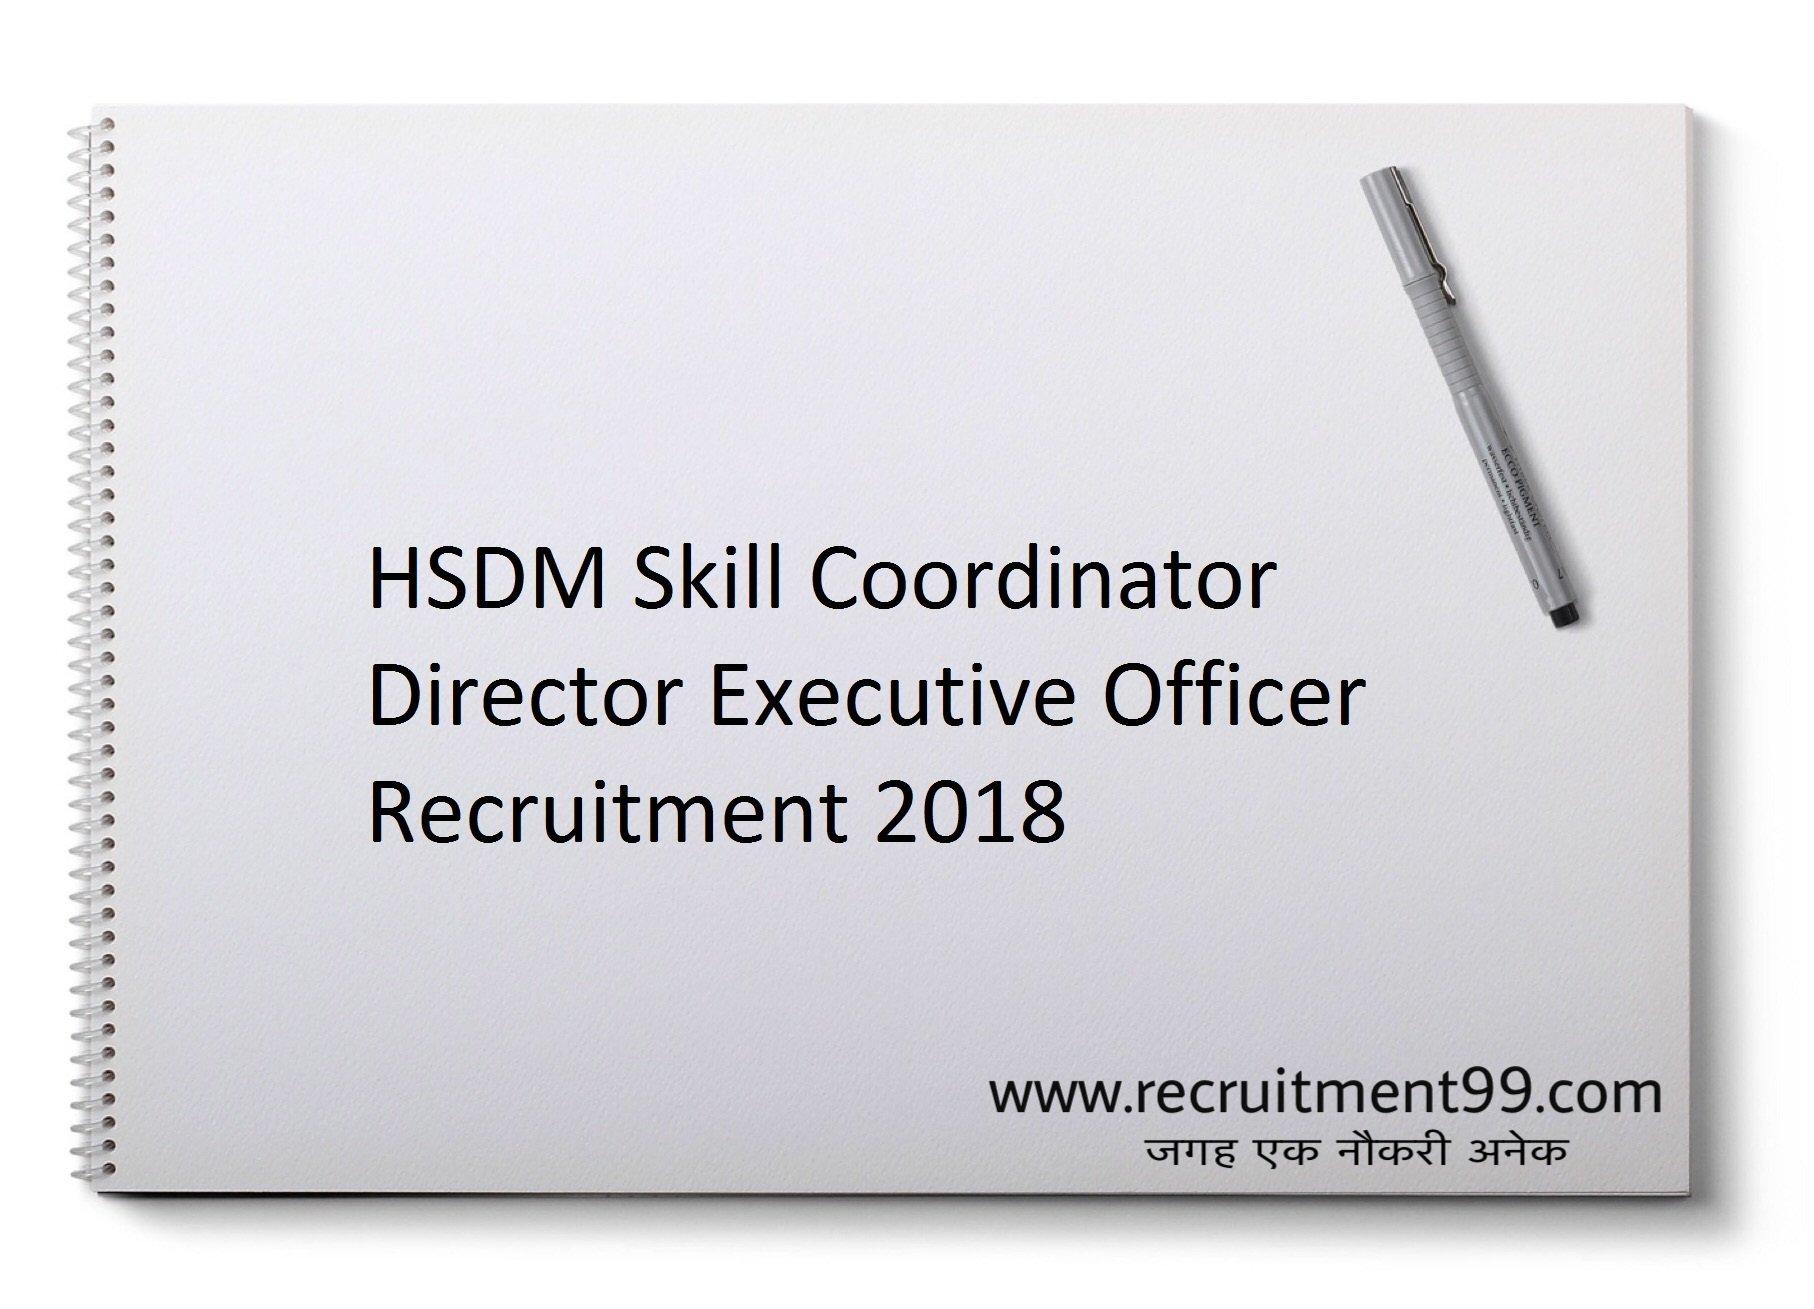 HSDM Skill Coordinator Director Executive Officer Recruitment Interview Date Result 2018